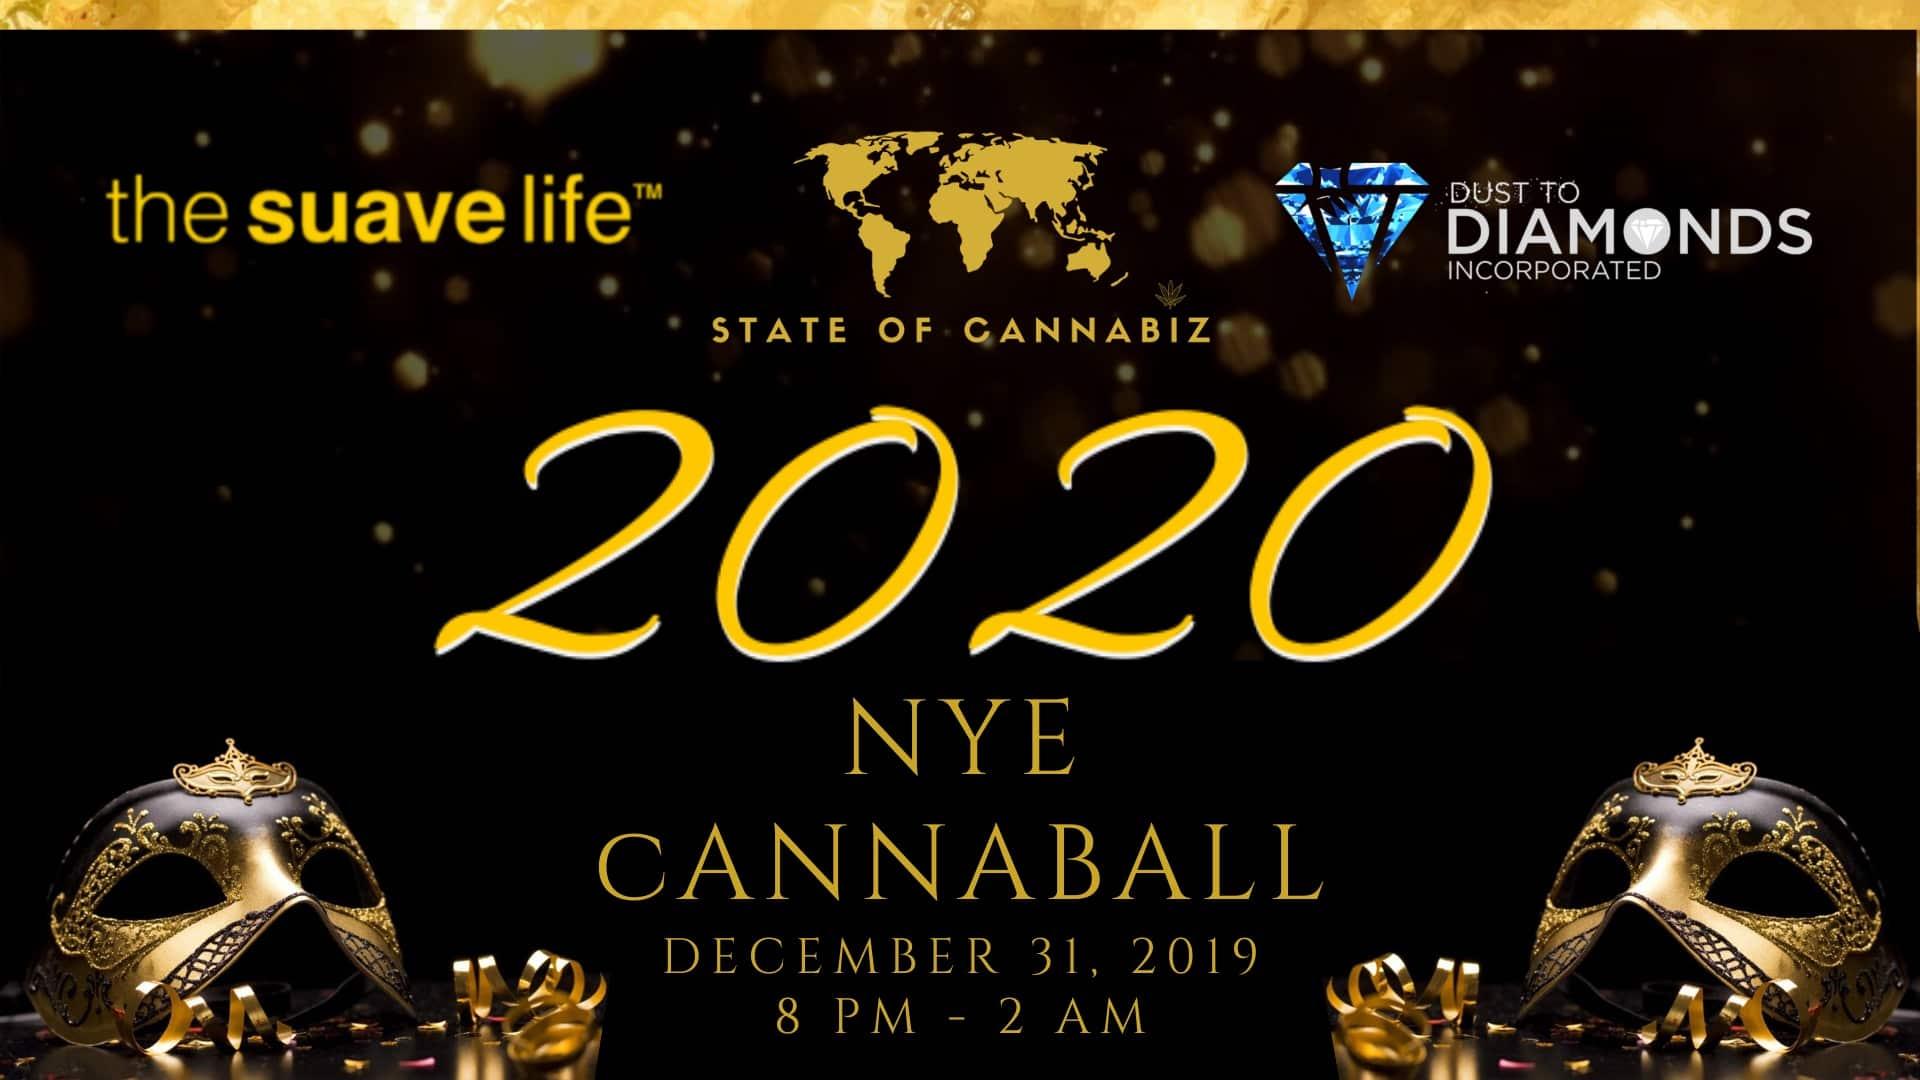 2020 NYE CannaBall & Civic Impact Awards VIP Reception (20% Off Promo)